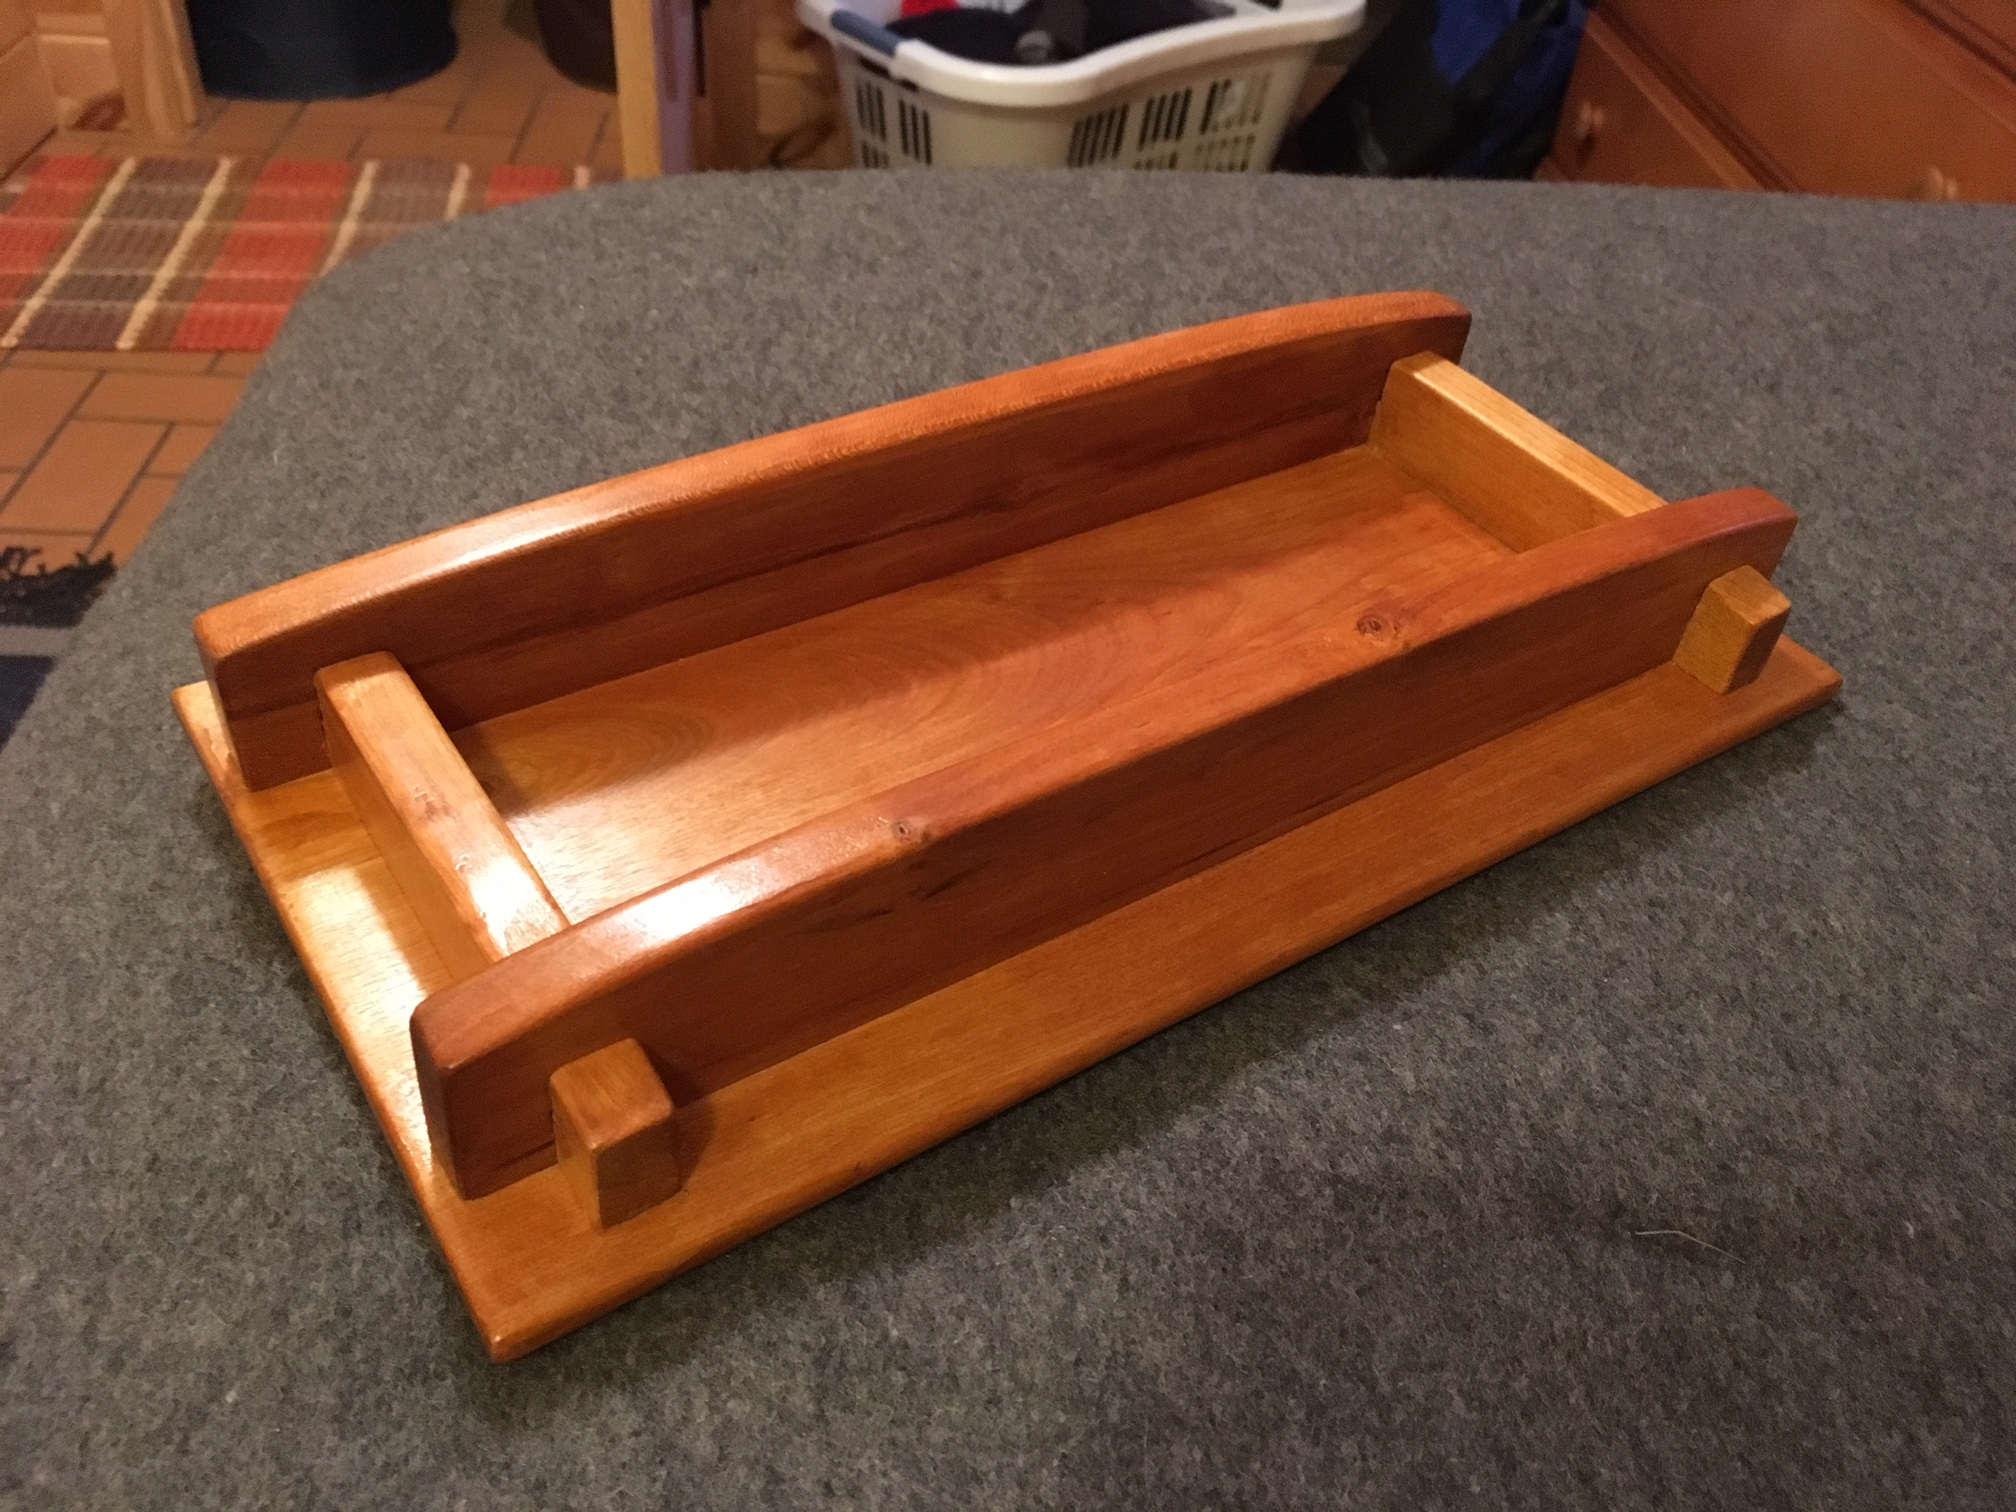 Wooden Tray by Tom Heikkinen